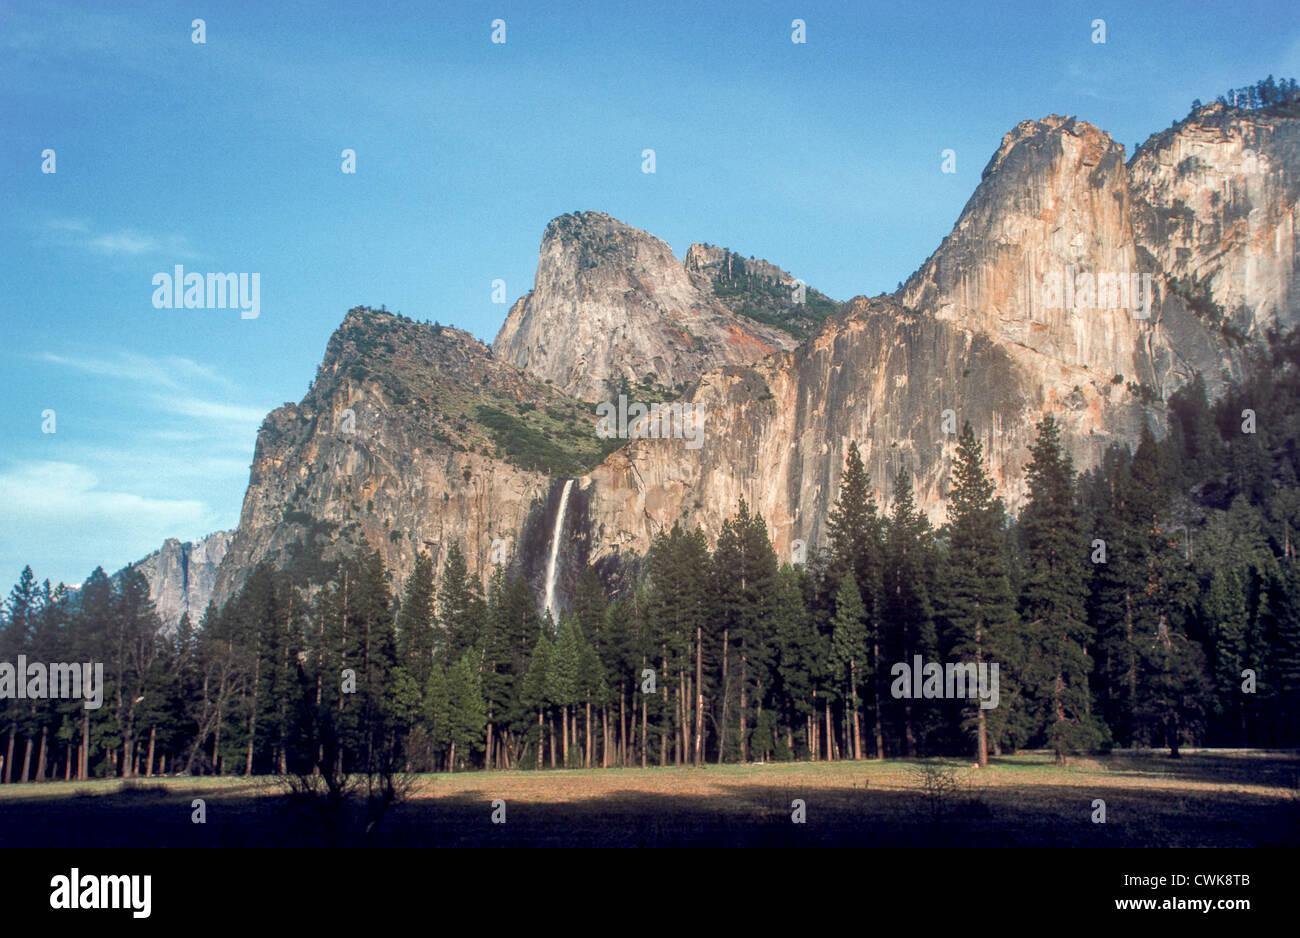 A view of Bridalveil Fall in Yosemite National Park, California, USA. Stock Photo